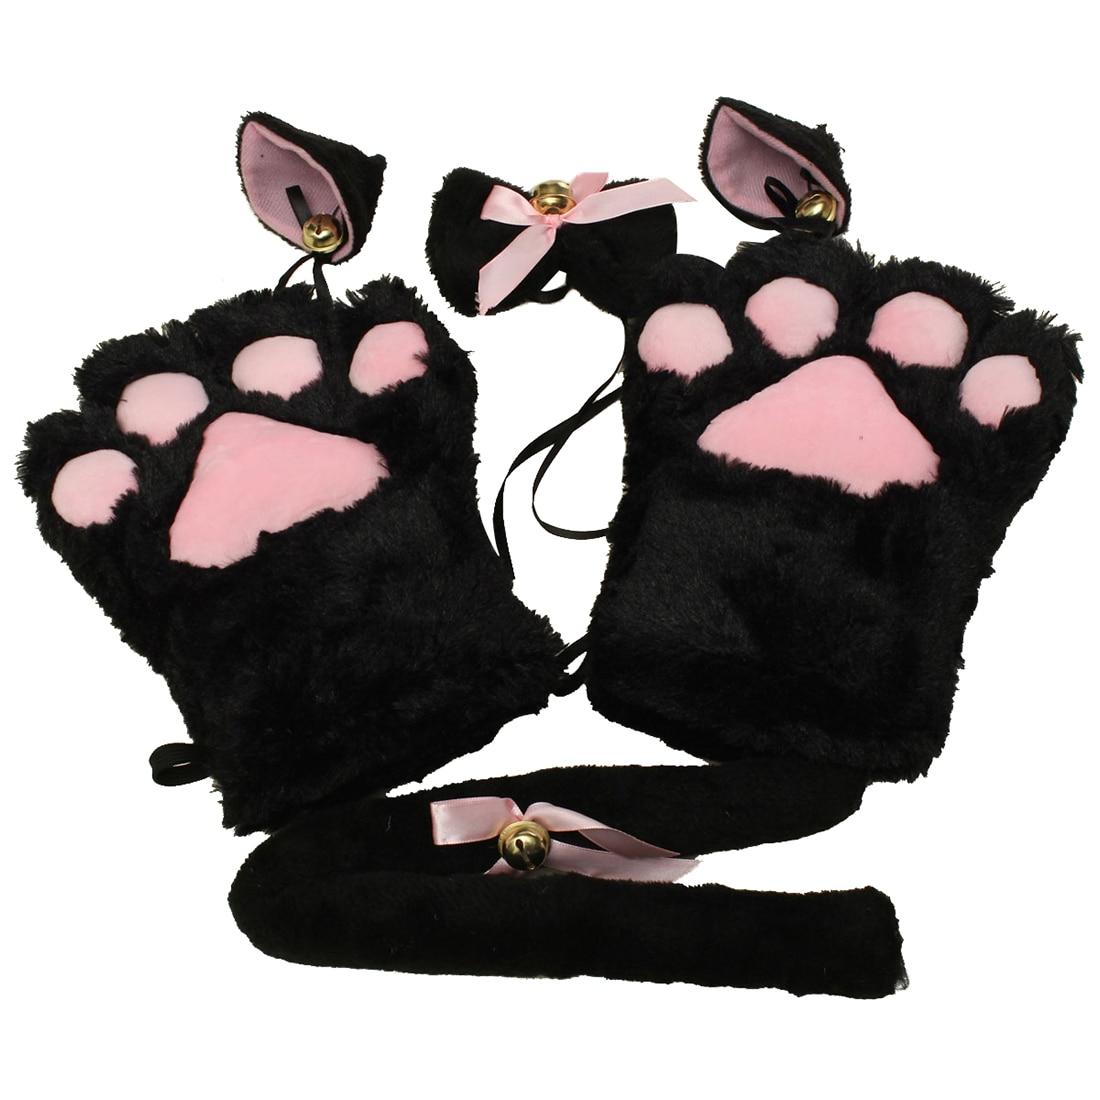 Kätzchen cat maid cosplay roleplay anime kostüm handschuhe pfote ohr schwanz krawatte party ganze set